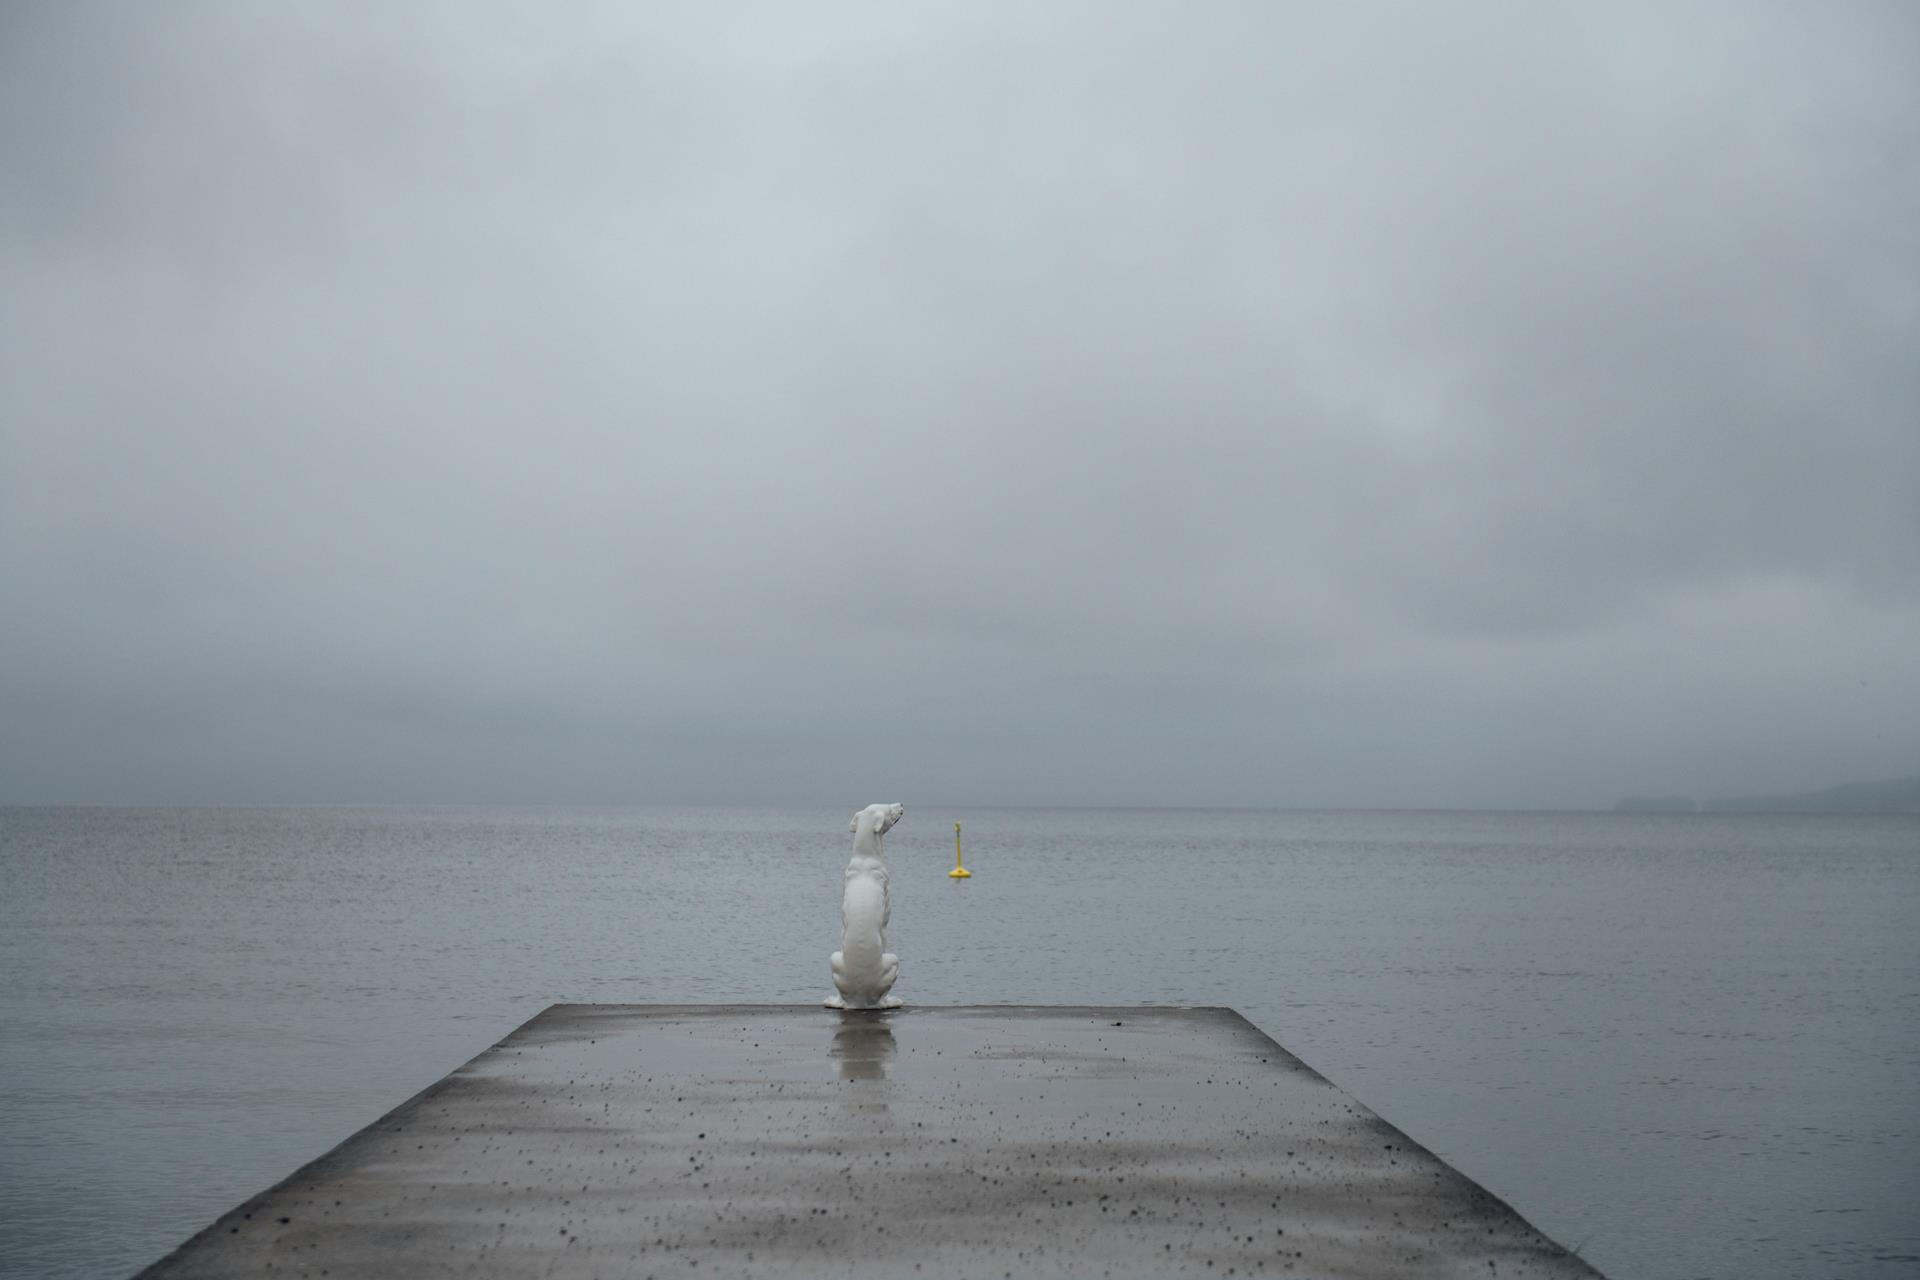 © Henriette Tronrud